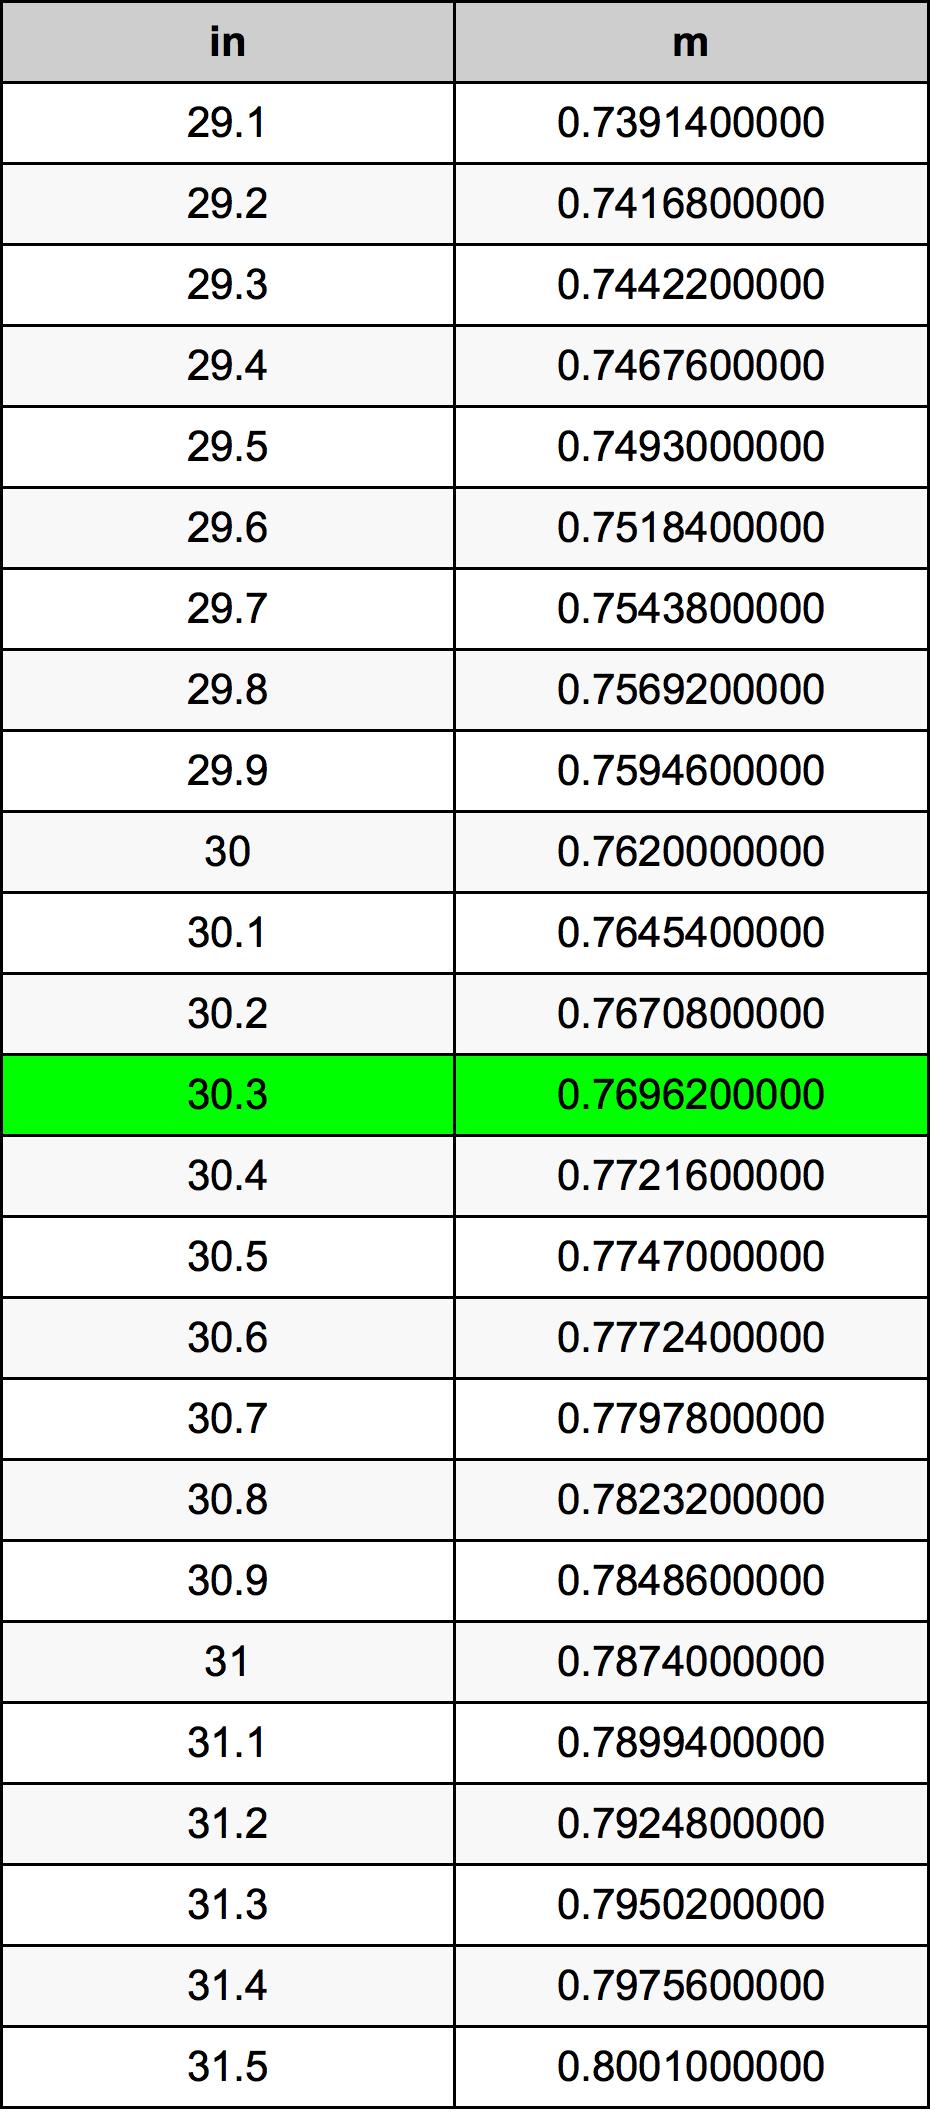 30.3 дюйм Таблица преобразования